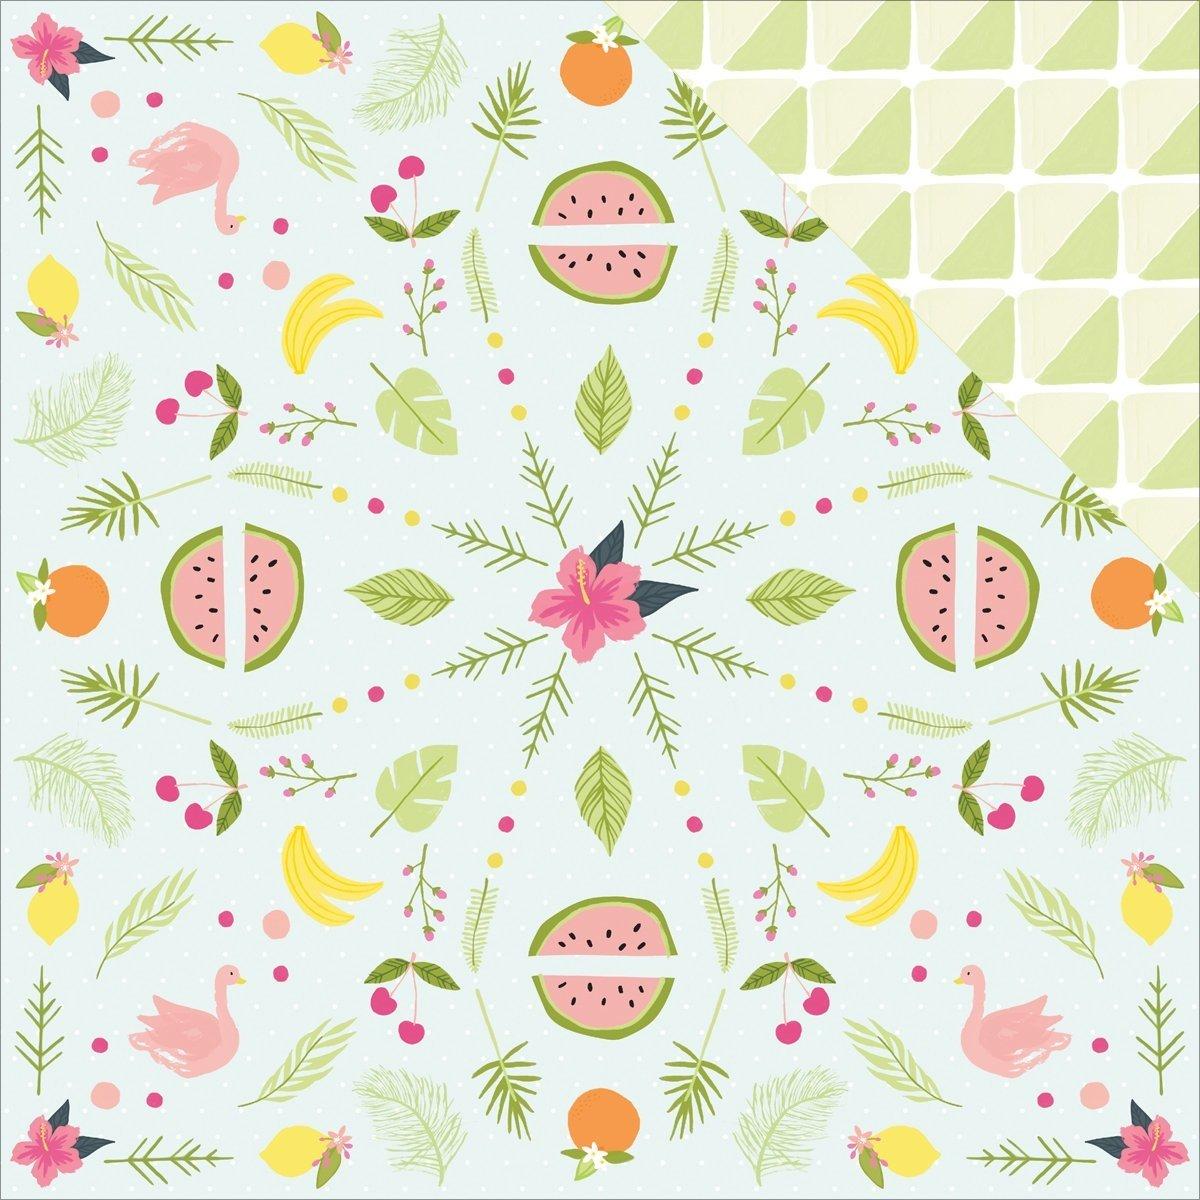 American Crafts Dear Lizzy Happy Place Doppelseitig tonkartons 12 Zoll x 12-inch-Tropical Tango (25 Stück) B01DIKUR6K | Exquisite Handwerkskunst